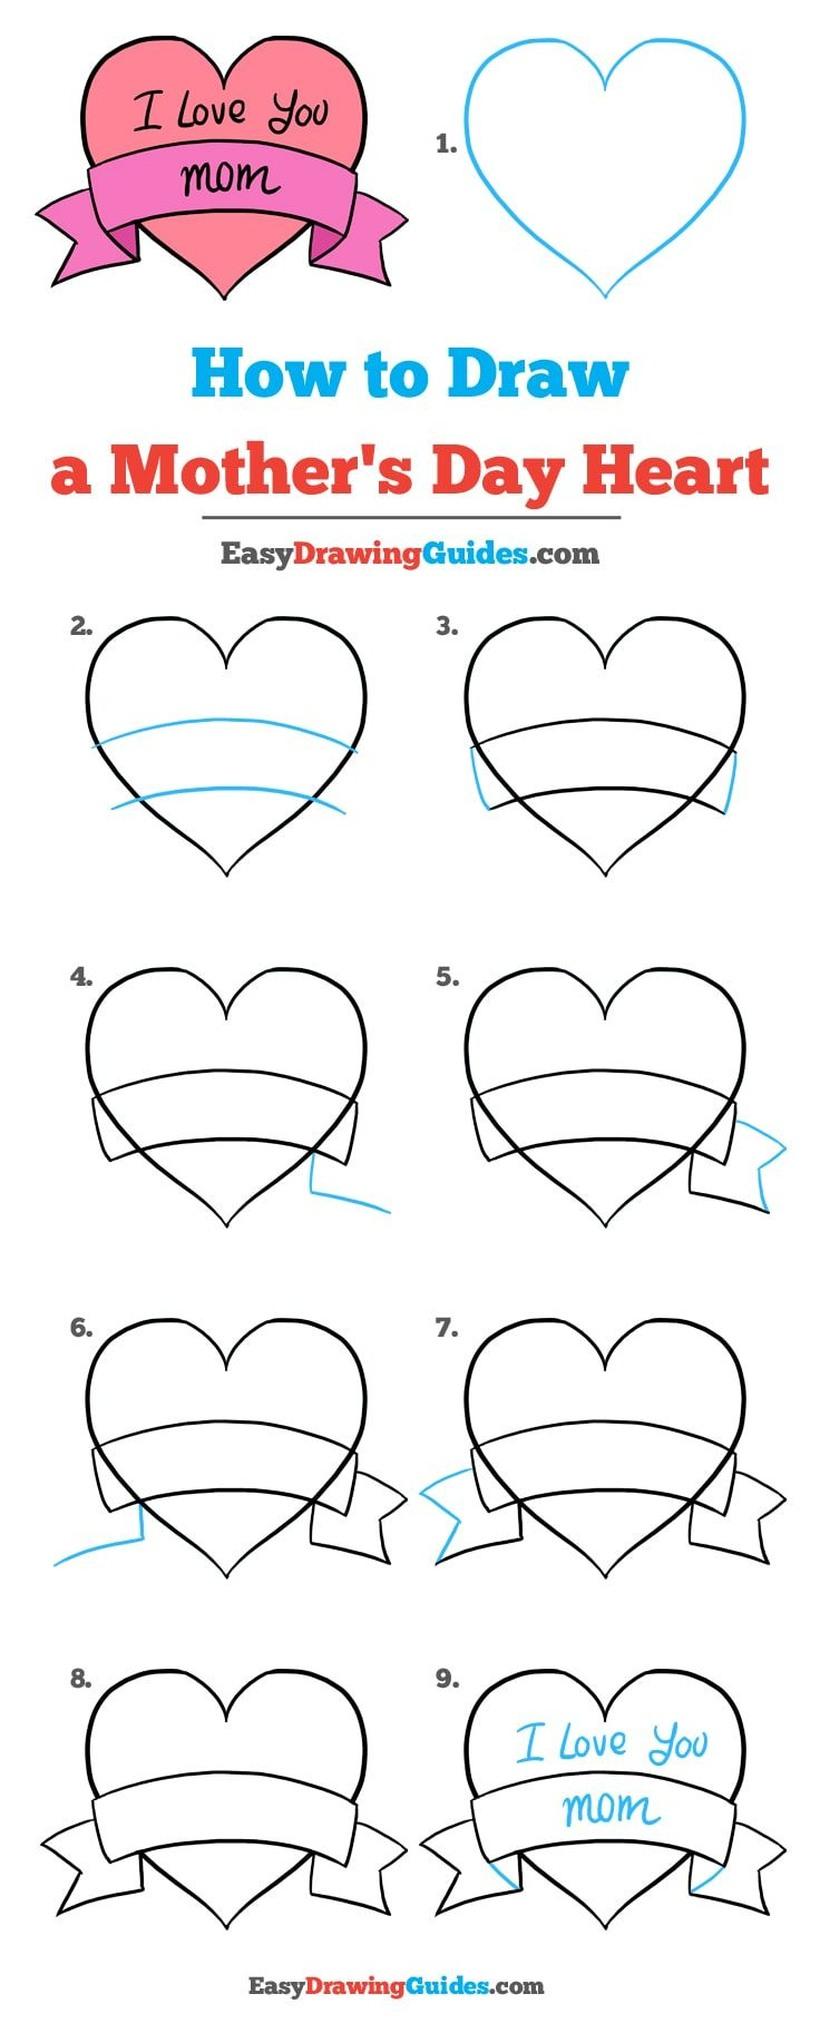 dibujos fáciles de corazones a lápiz paso a paso con frase i love you mom palabra amor